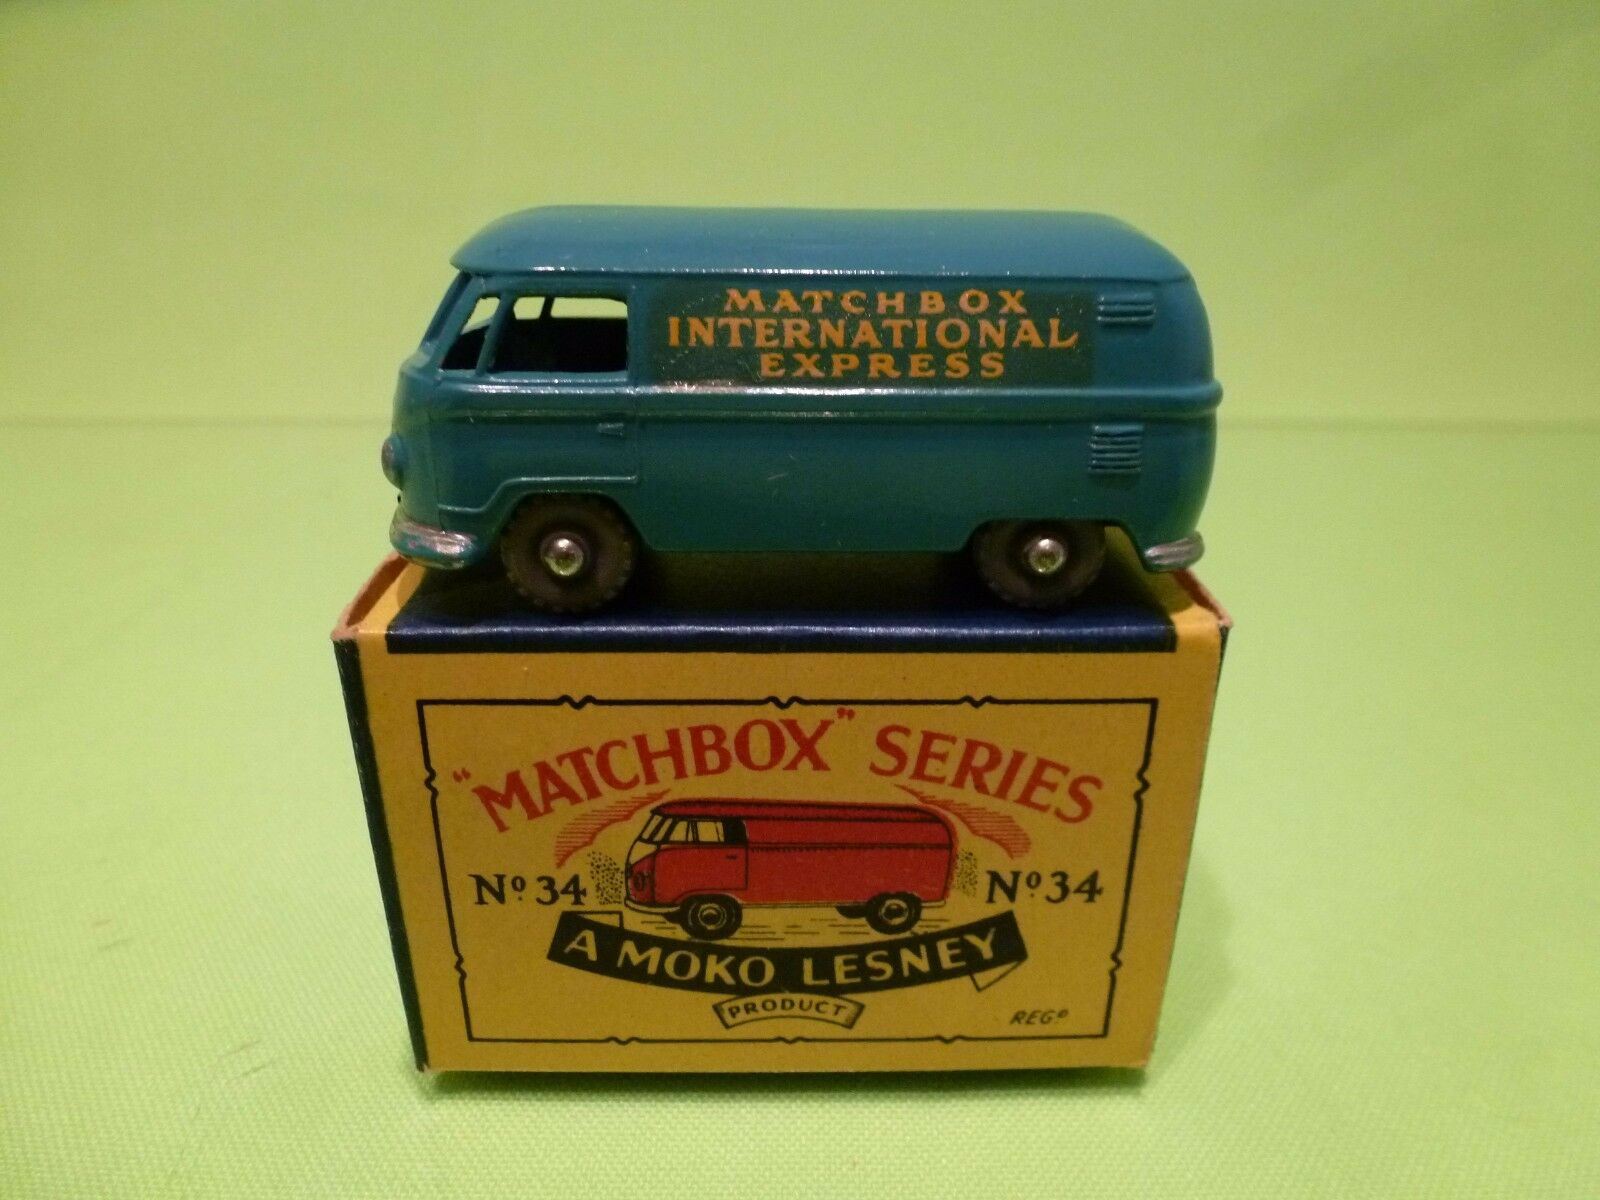 LESNEY MOKO MATCHBOX 34 VW VOLKSWAGEN T1  - MINT MINT MINT IN BOX - HIGH QUALITY - RARE 498d0c